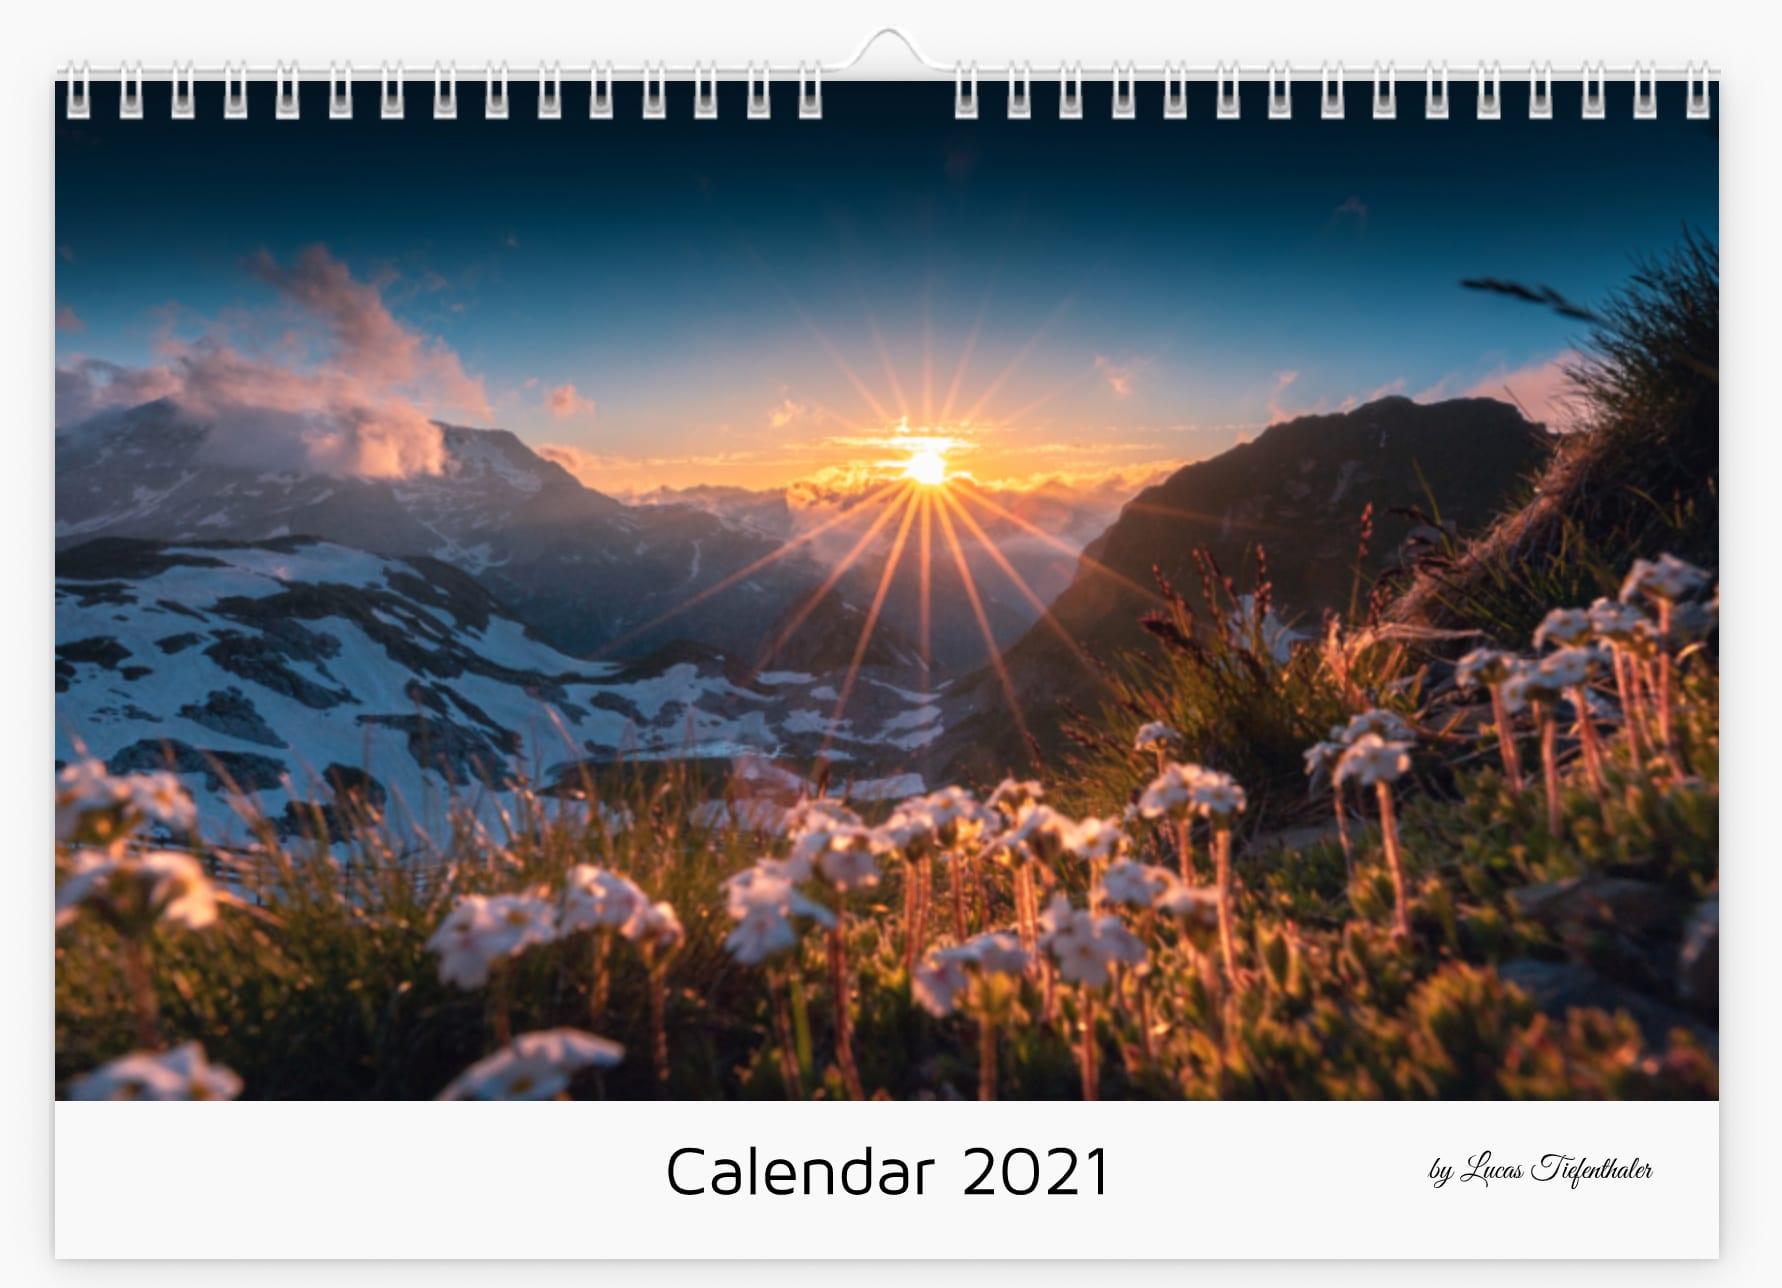 Calendar 2021 - Calendar 2021